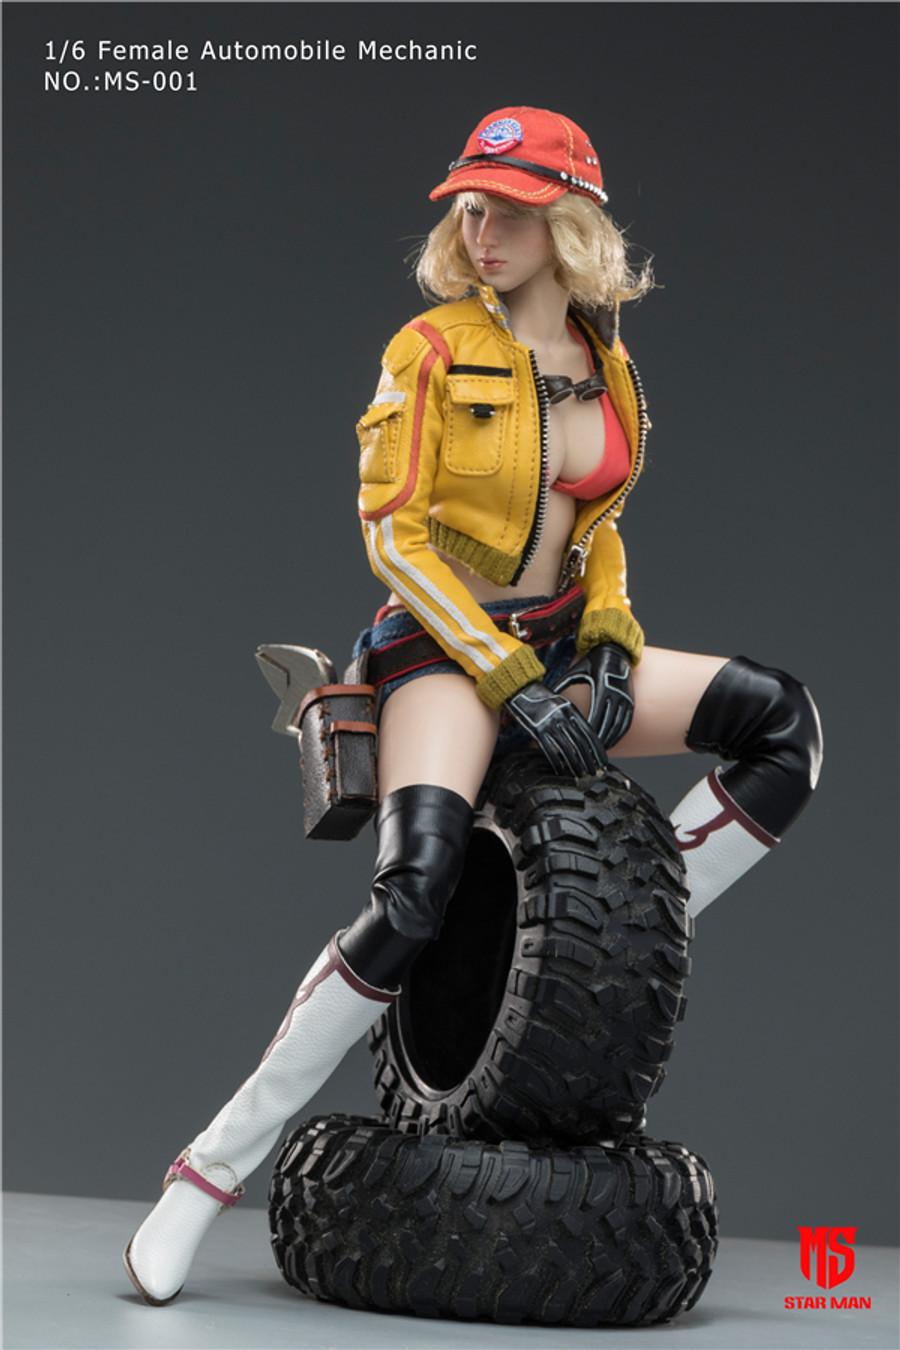 Star Man - Female Automobile Mechanic